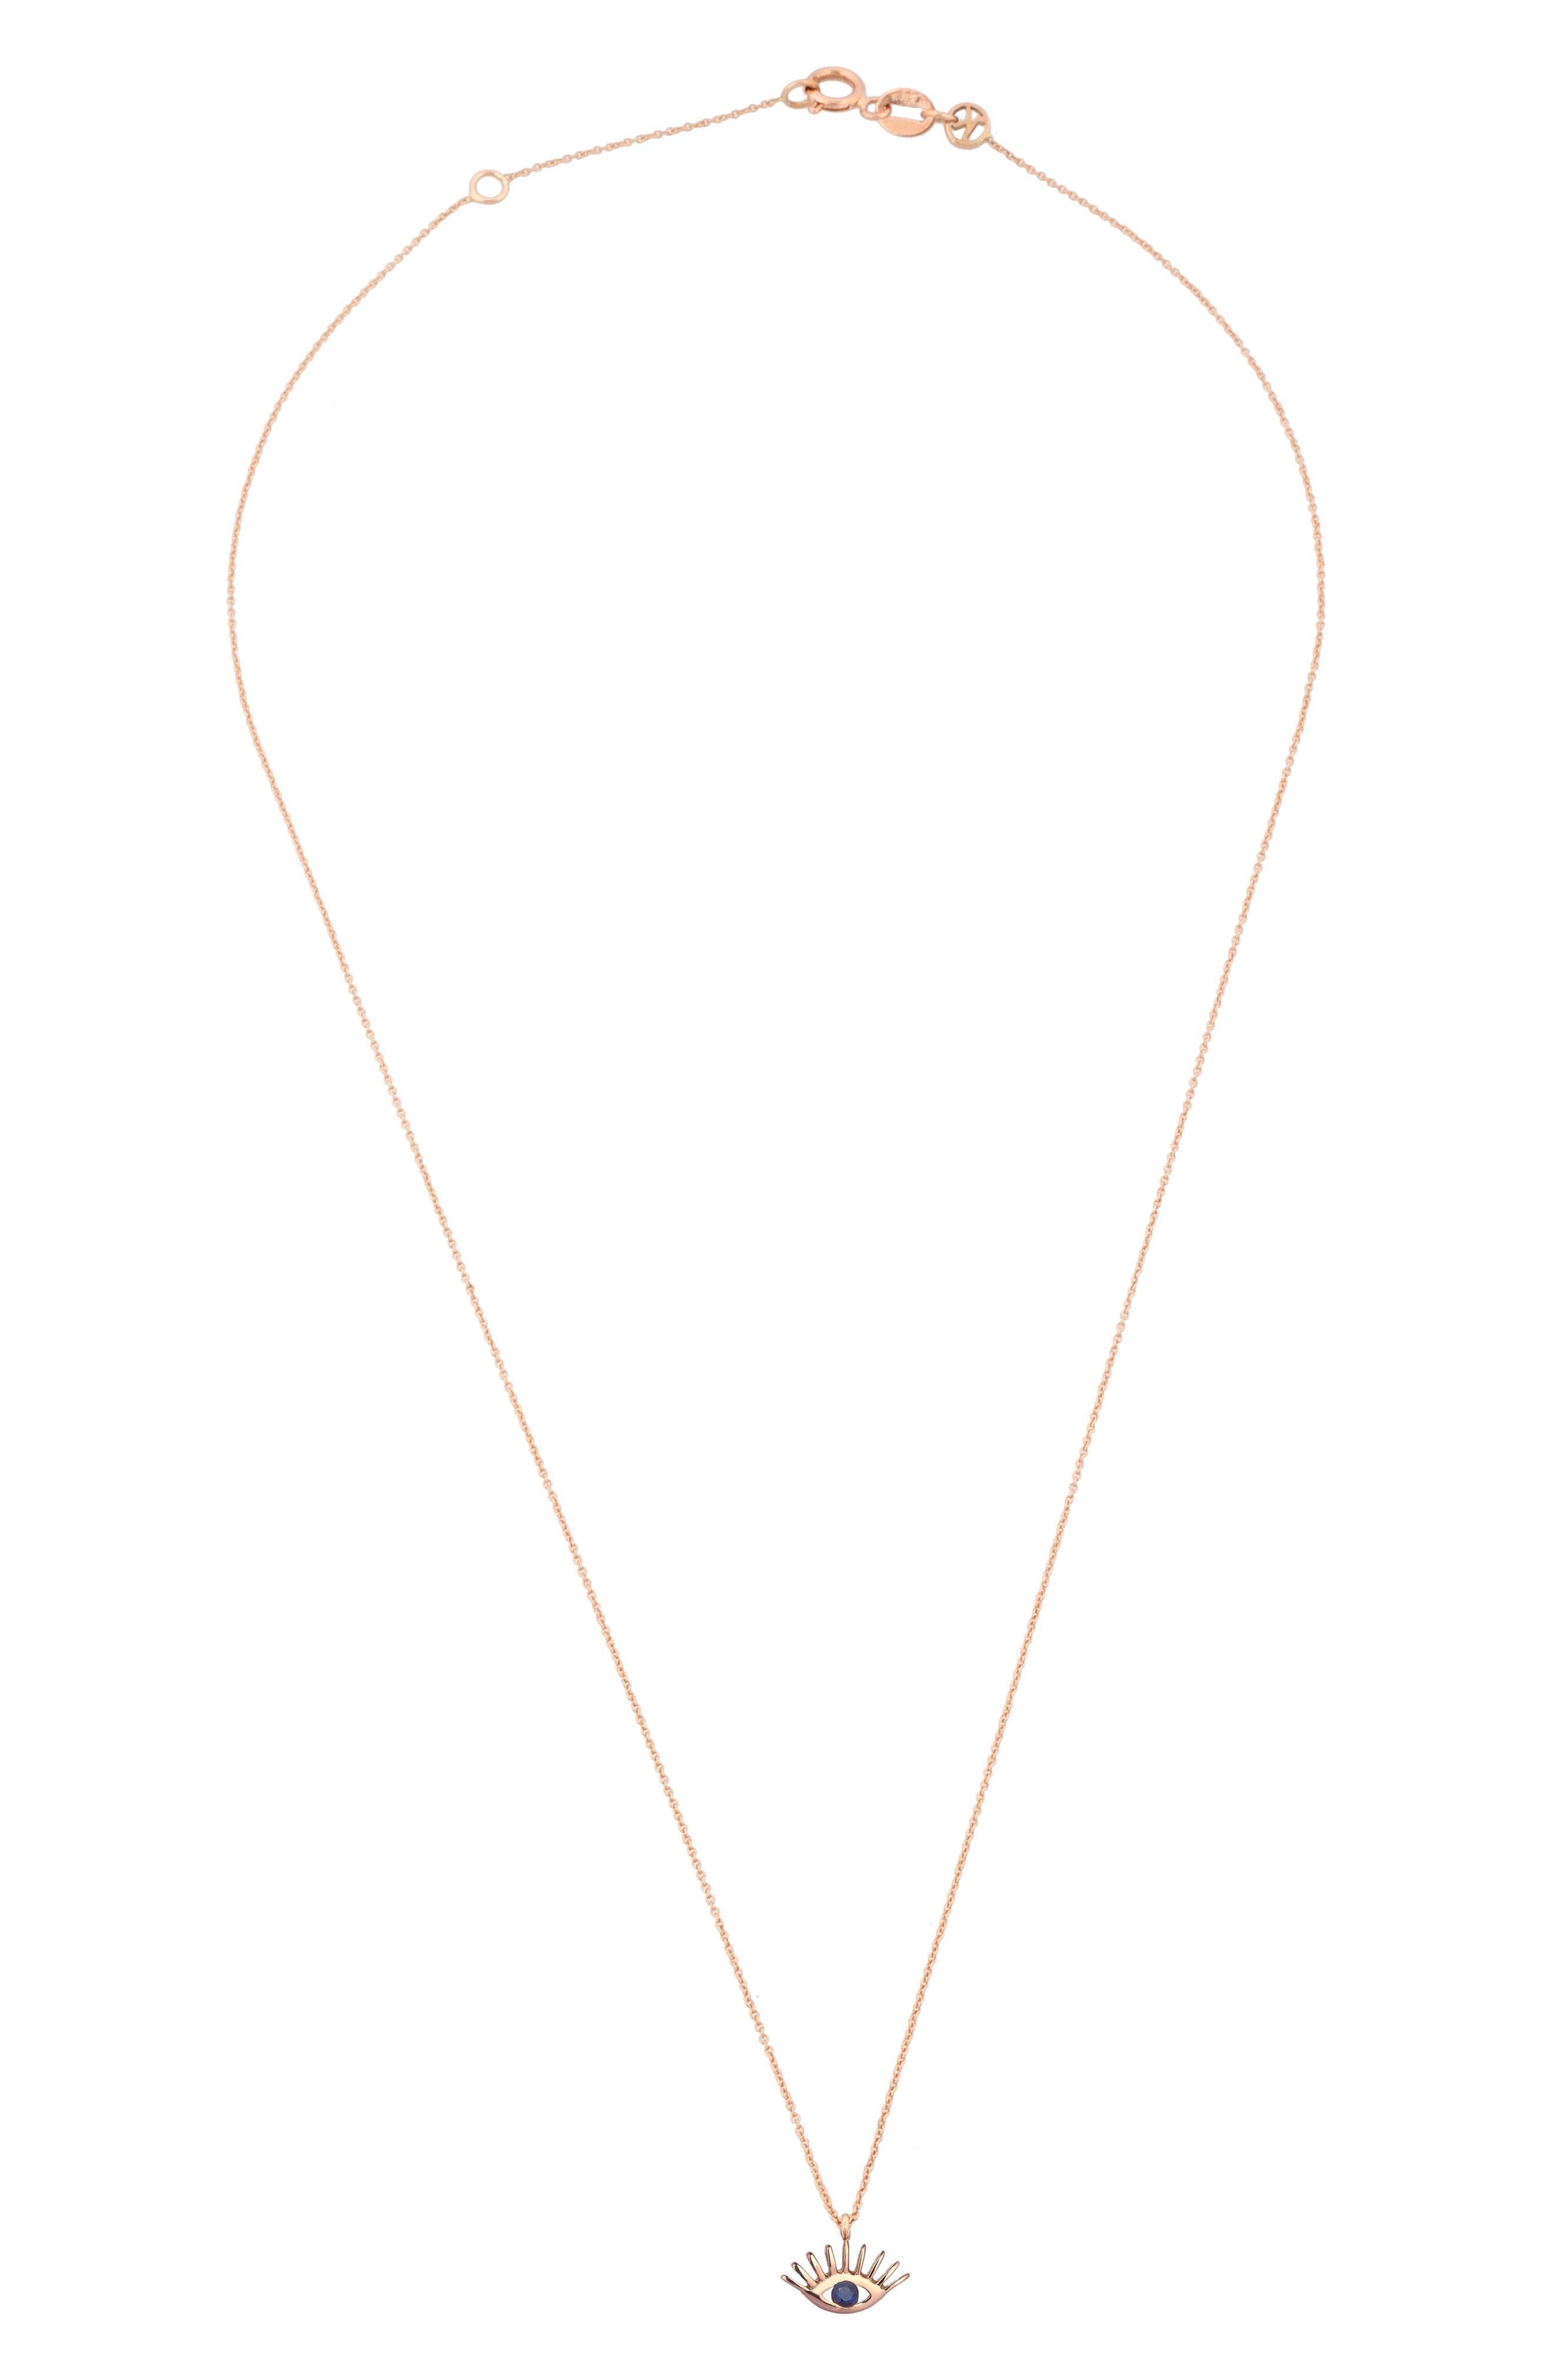 Sapphire Pendant Necklace,                             Alternate thumbnail 2, color,                             ROSE GOLD